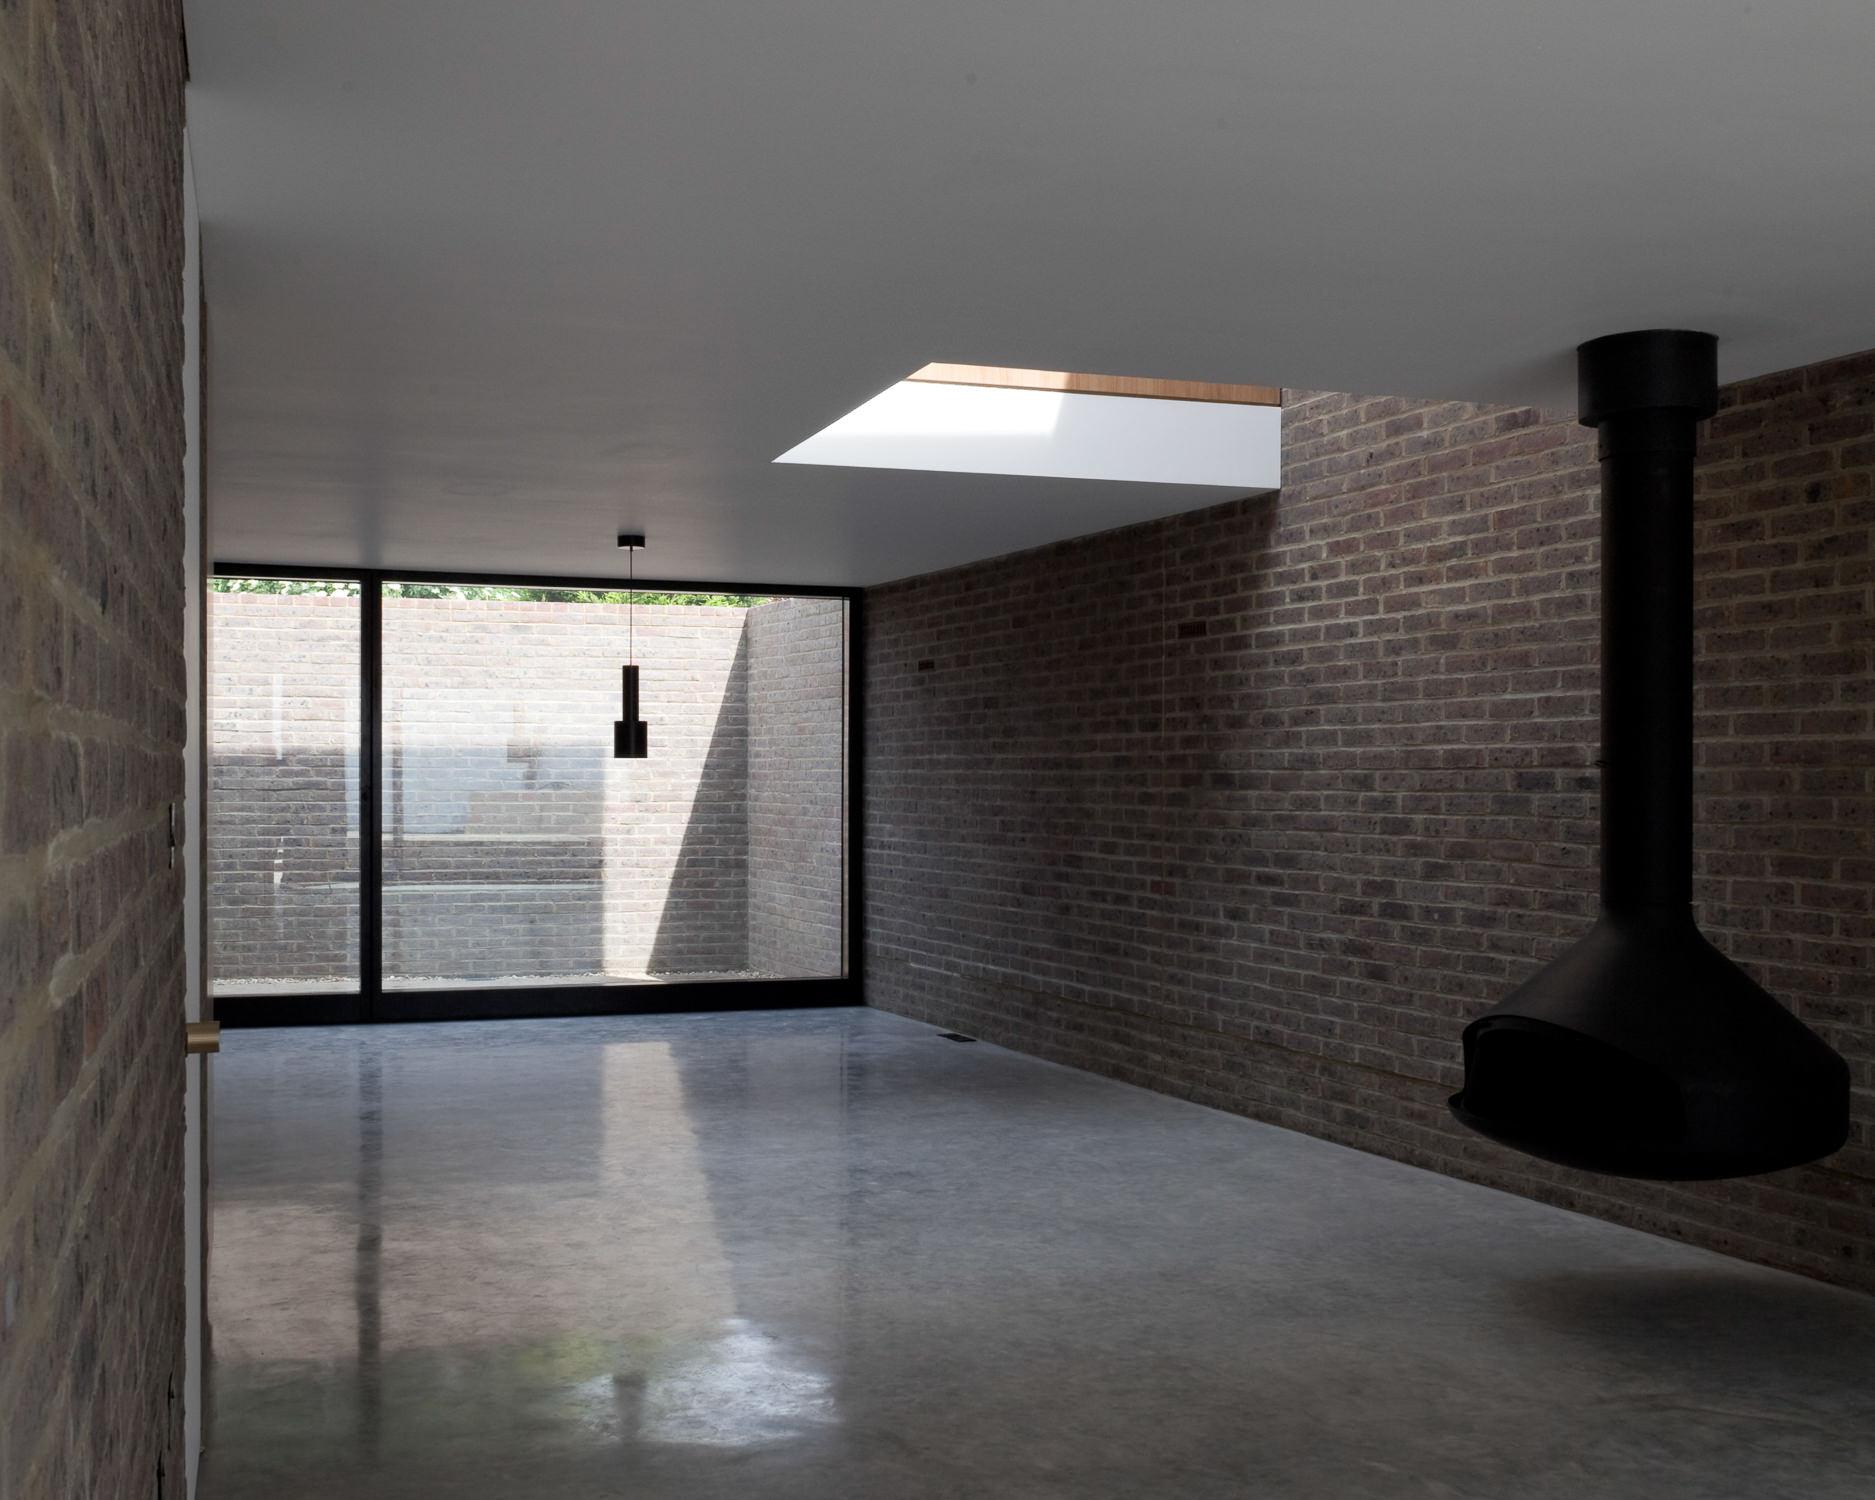 mark-hadden-architecture-photographer-architectuur-interieur-fotografie-london-amsterdam-Kings Avenue_© MH 11.jpg